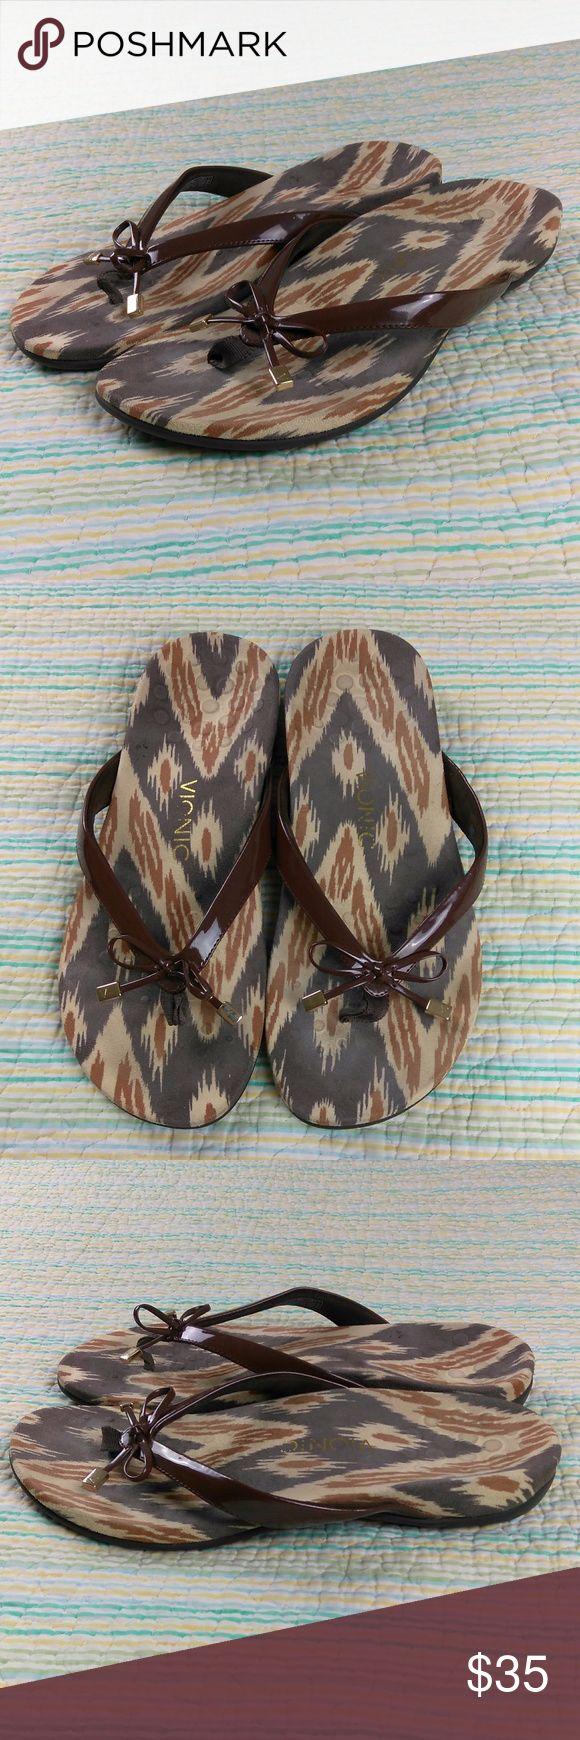 Vionic 9 Bella II Brown Bow Flip Flop Thong Sandal Vionic Women's Size 9 Bella II Brown Bow Flip Flop Thong Orthaheel Sandals Vionic Shoes Sandals